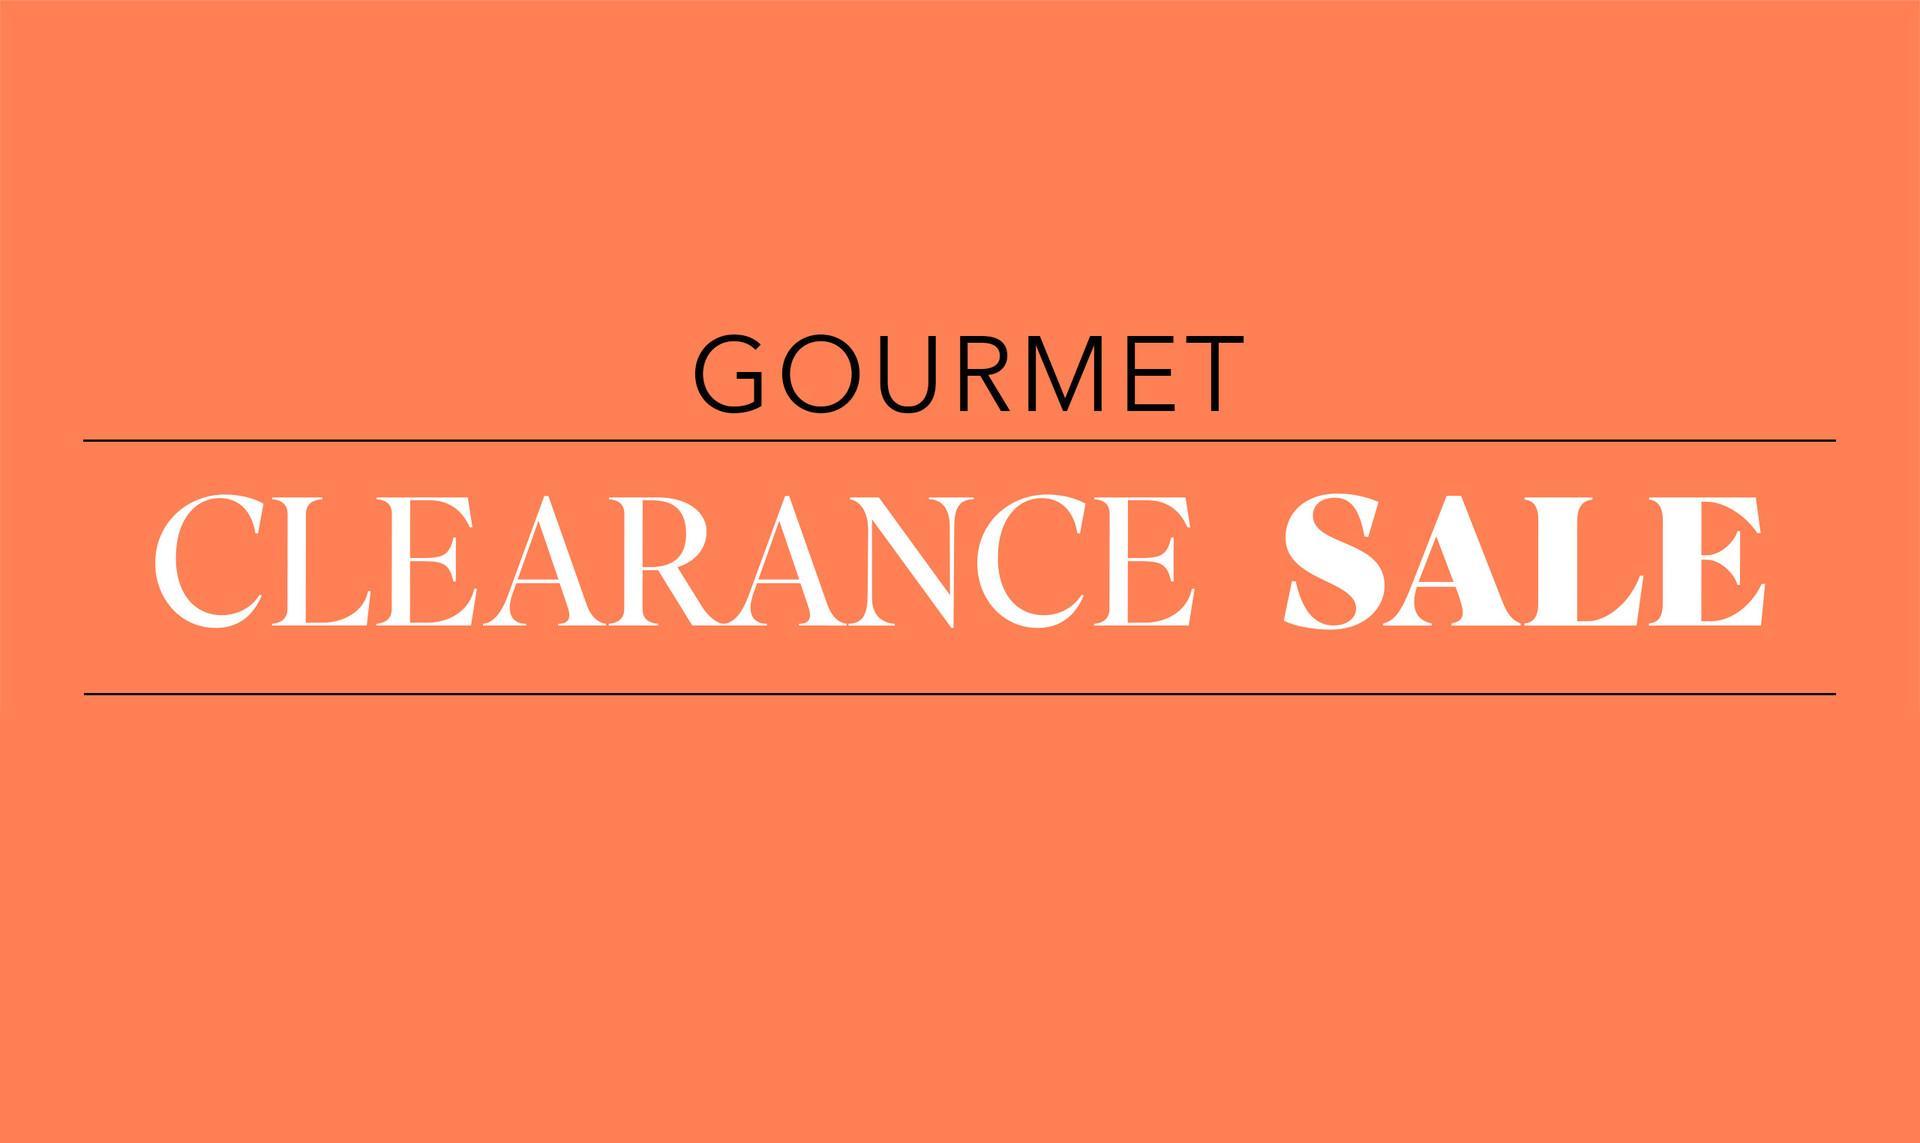 Clearance Sale Gourmet